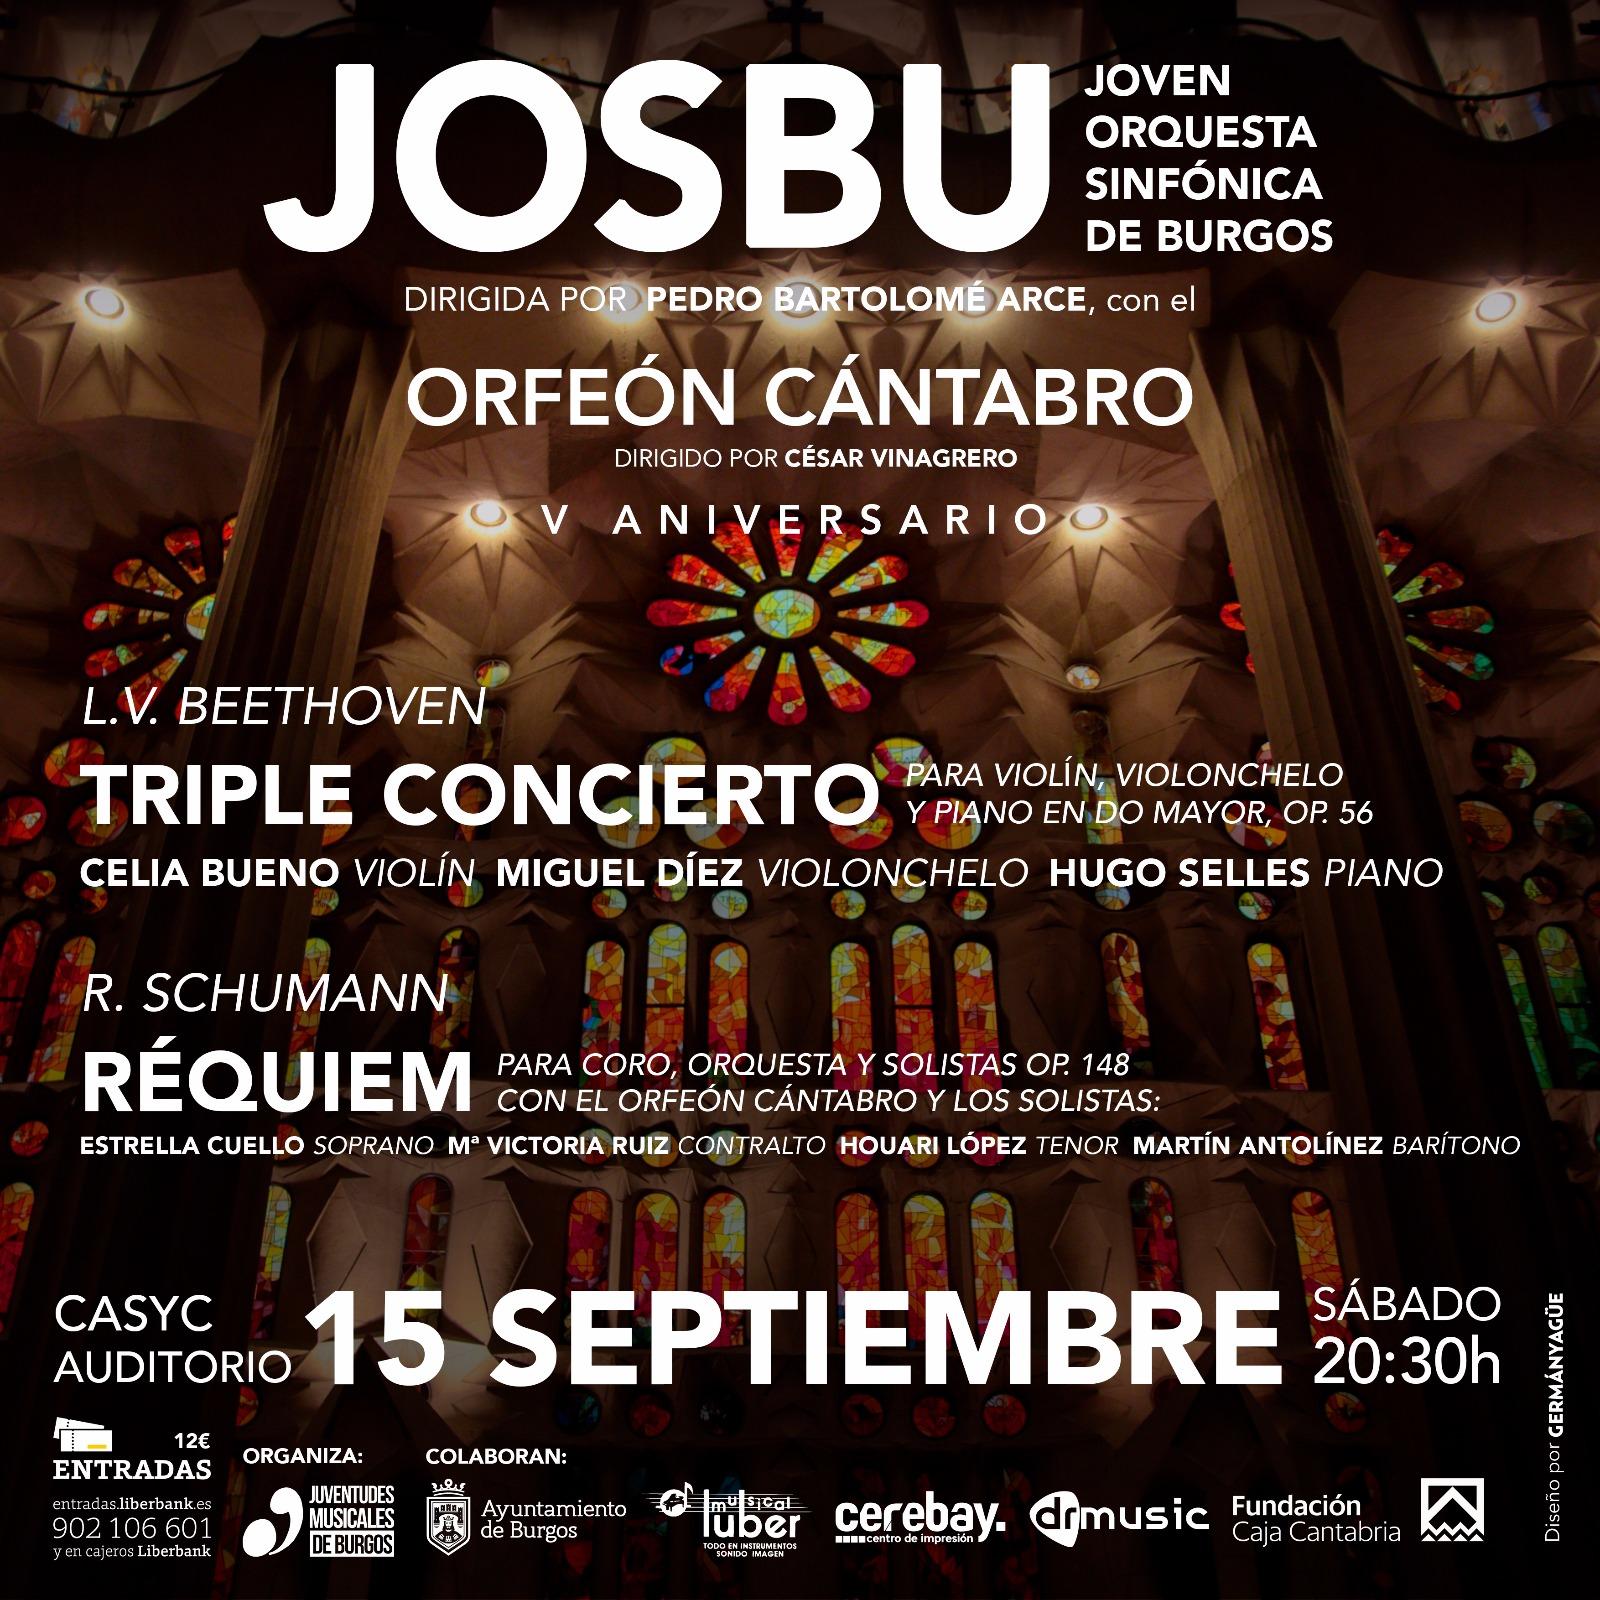 JOSBU 18-4 Santander